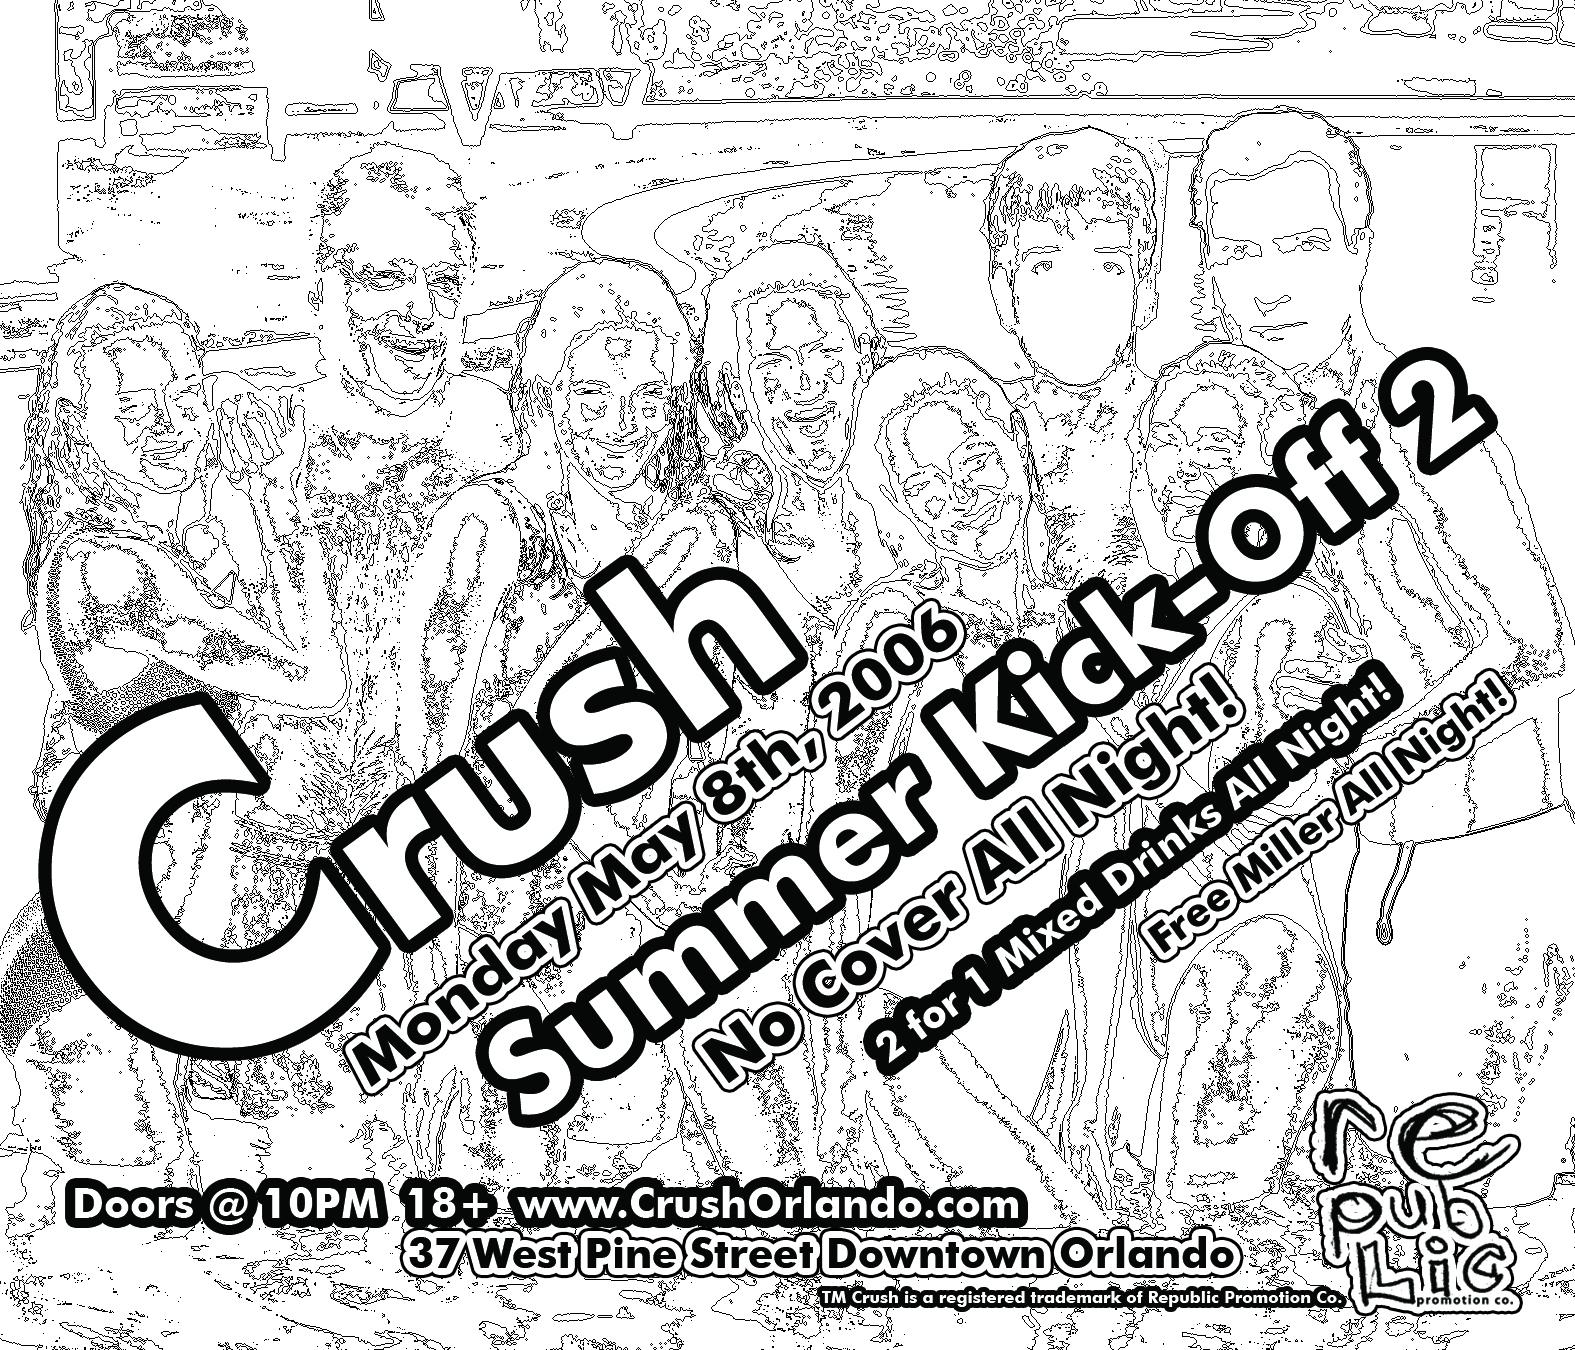 back_crush.jpg